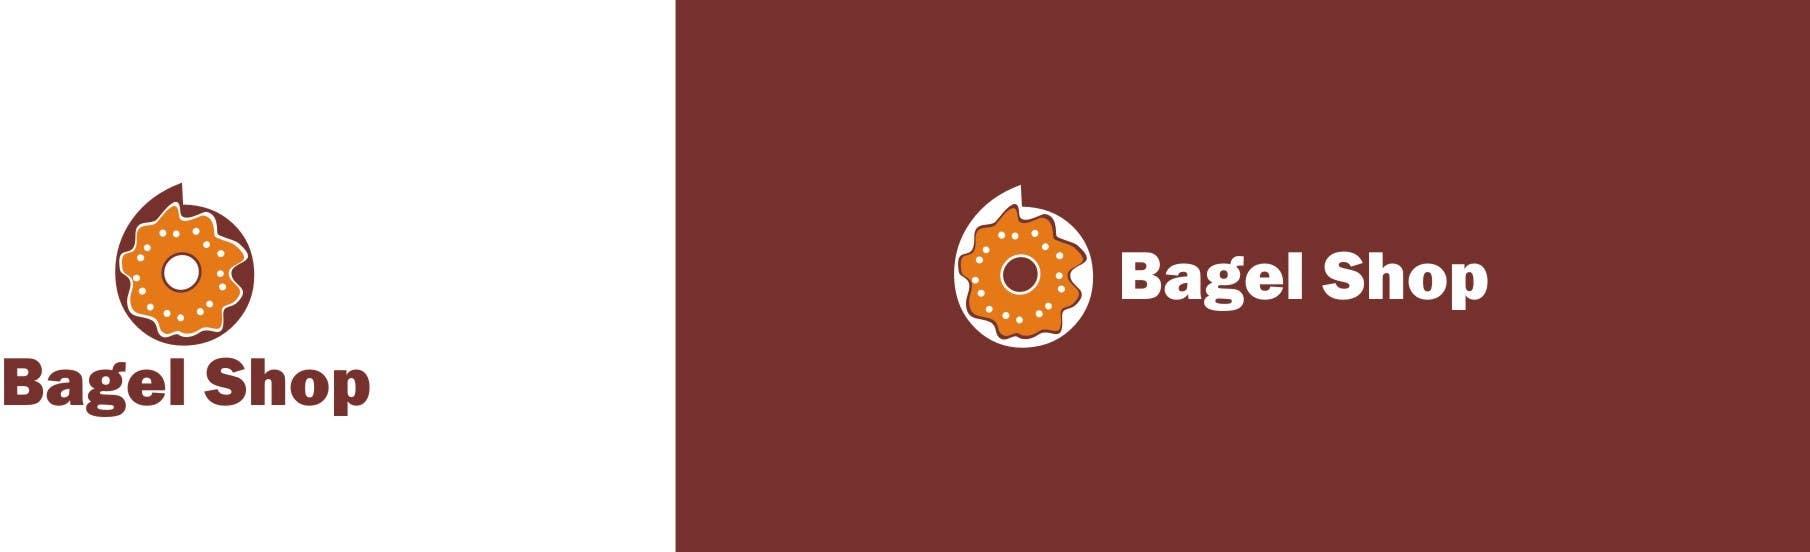 bagel shop essay contest